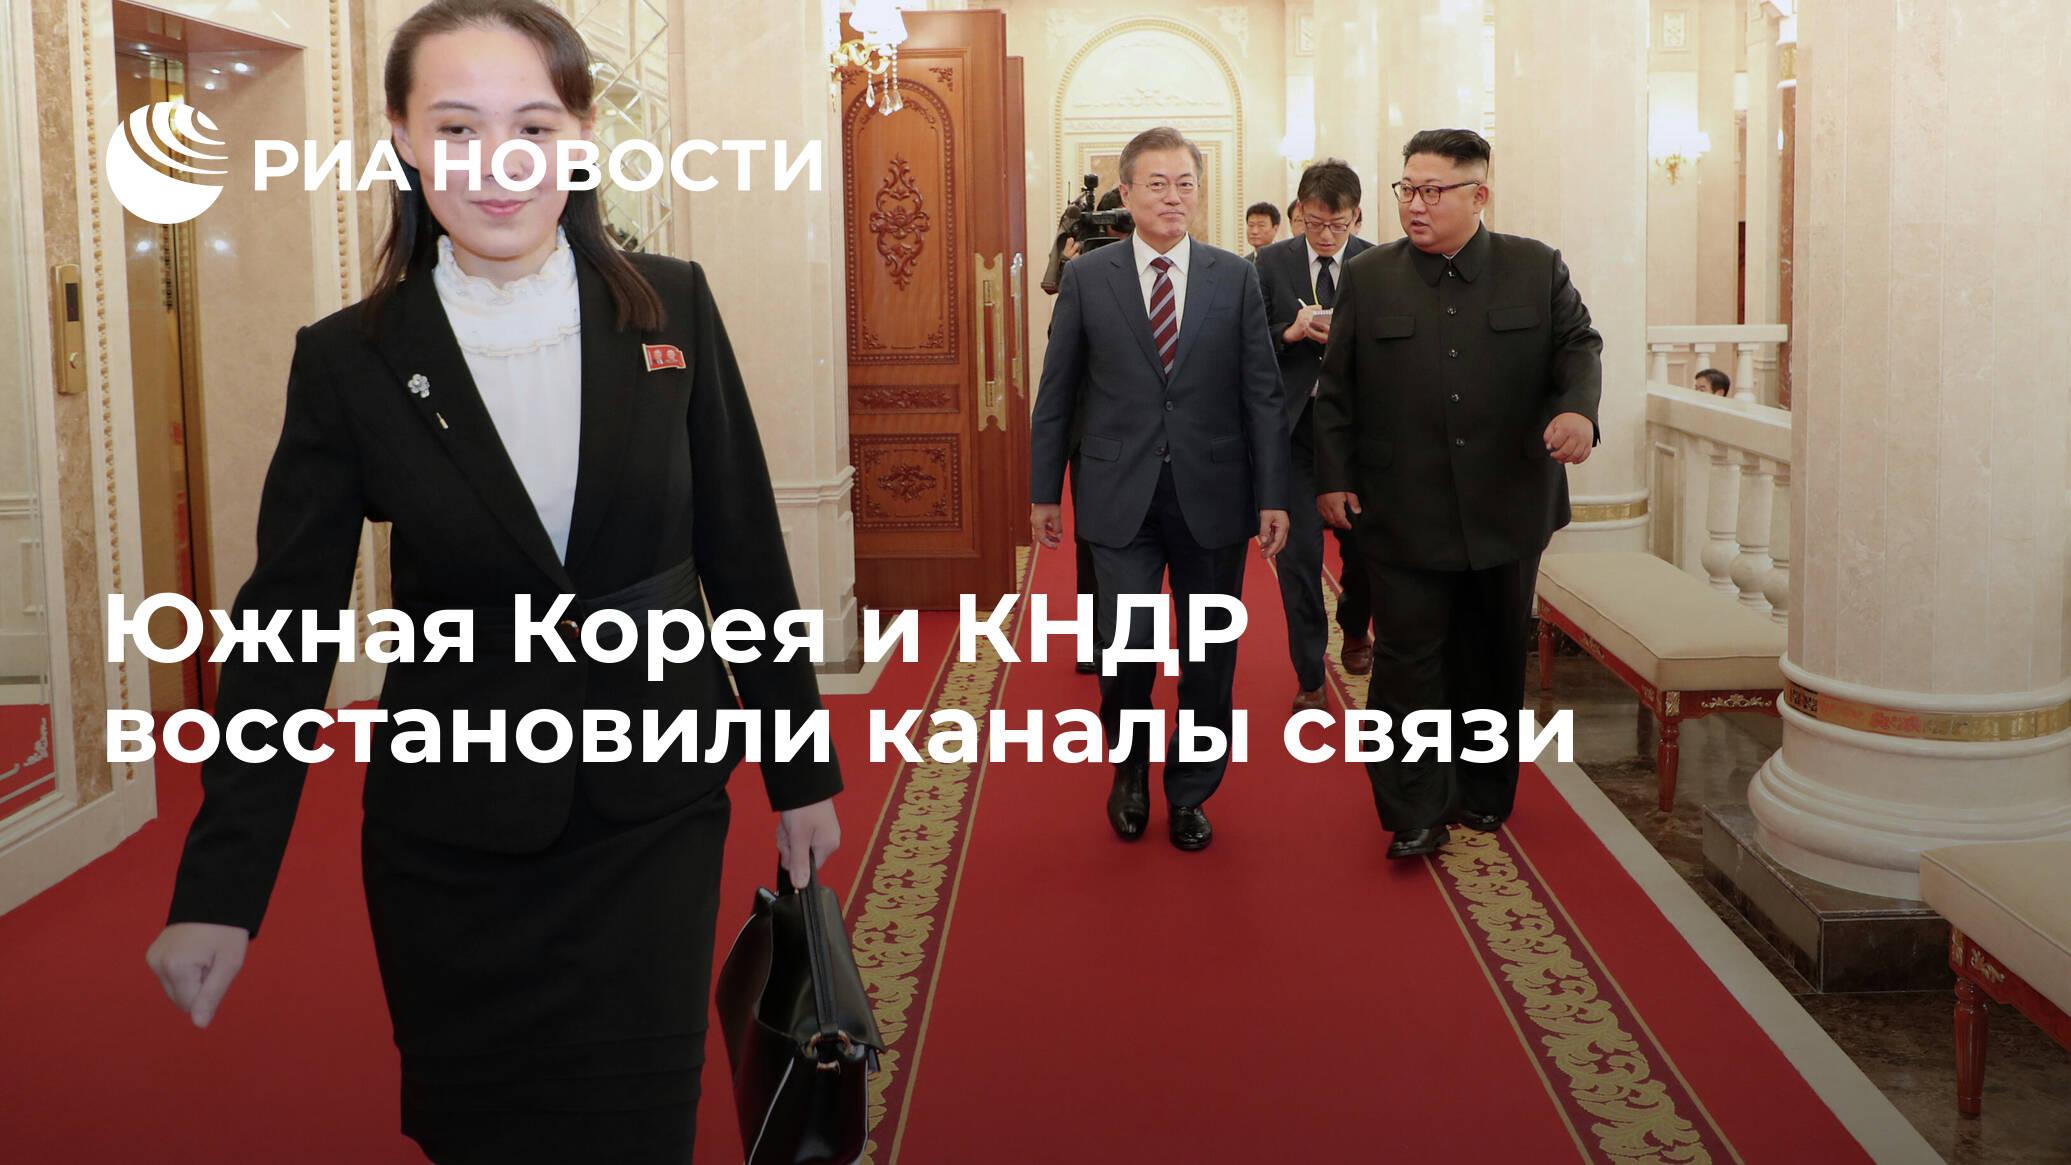 Южная Корея и КНДР восстановили каналы связи, сообщают СМИ